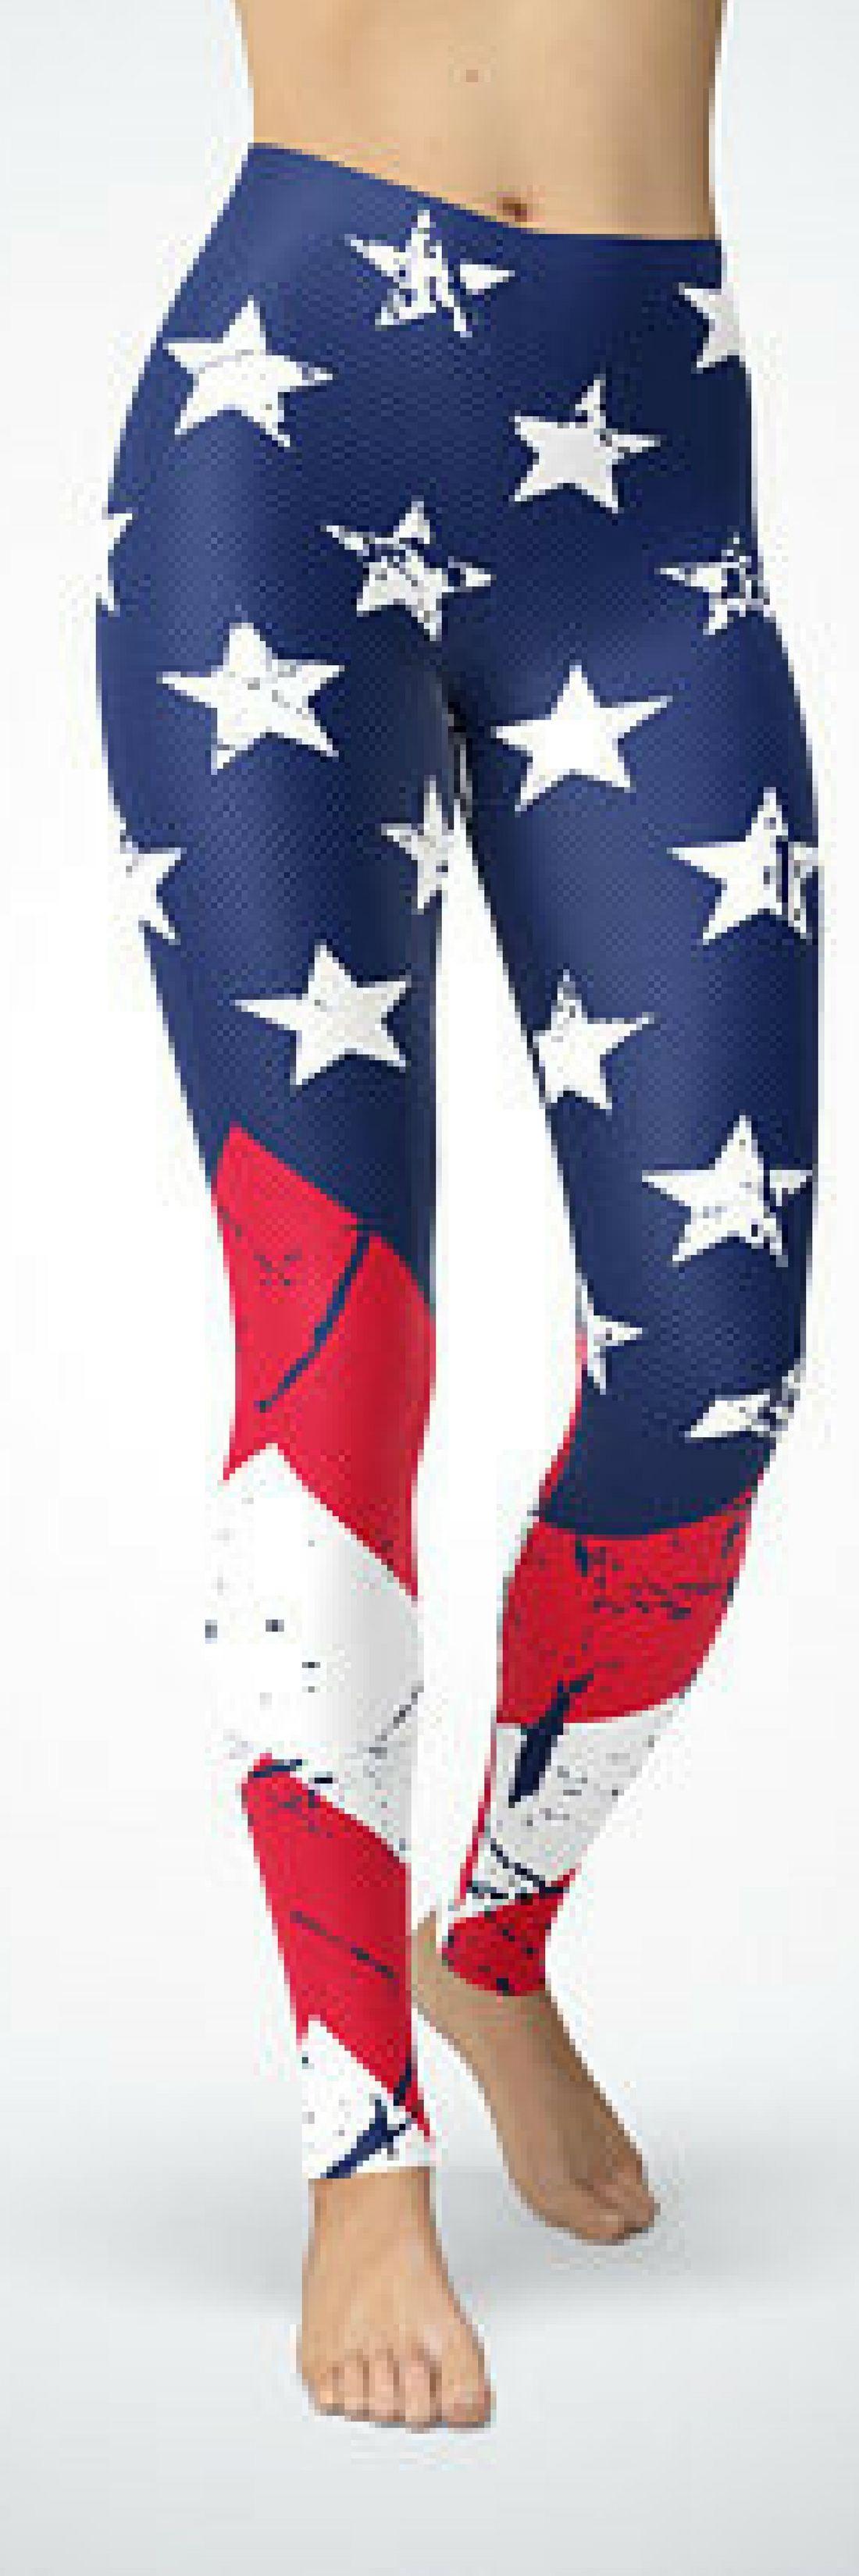 bdcd4720e414 American Flag Leggings USA Flag Clothing Yoga Leggings Blue Red Capri Pants  American Flag Stars Stripes Patriotic Yoga Pants United States   workoutclothes ...